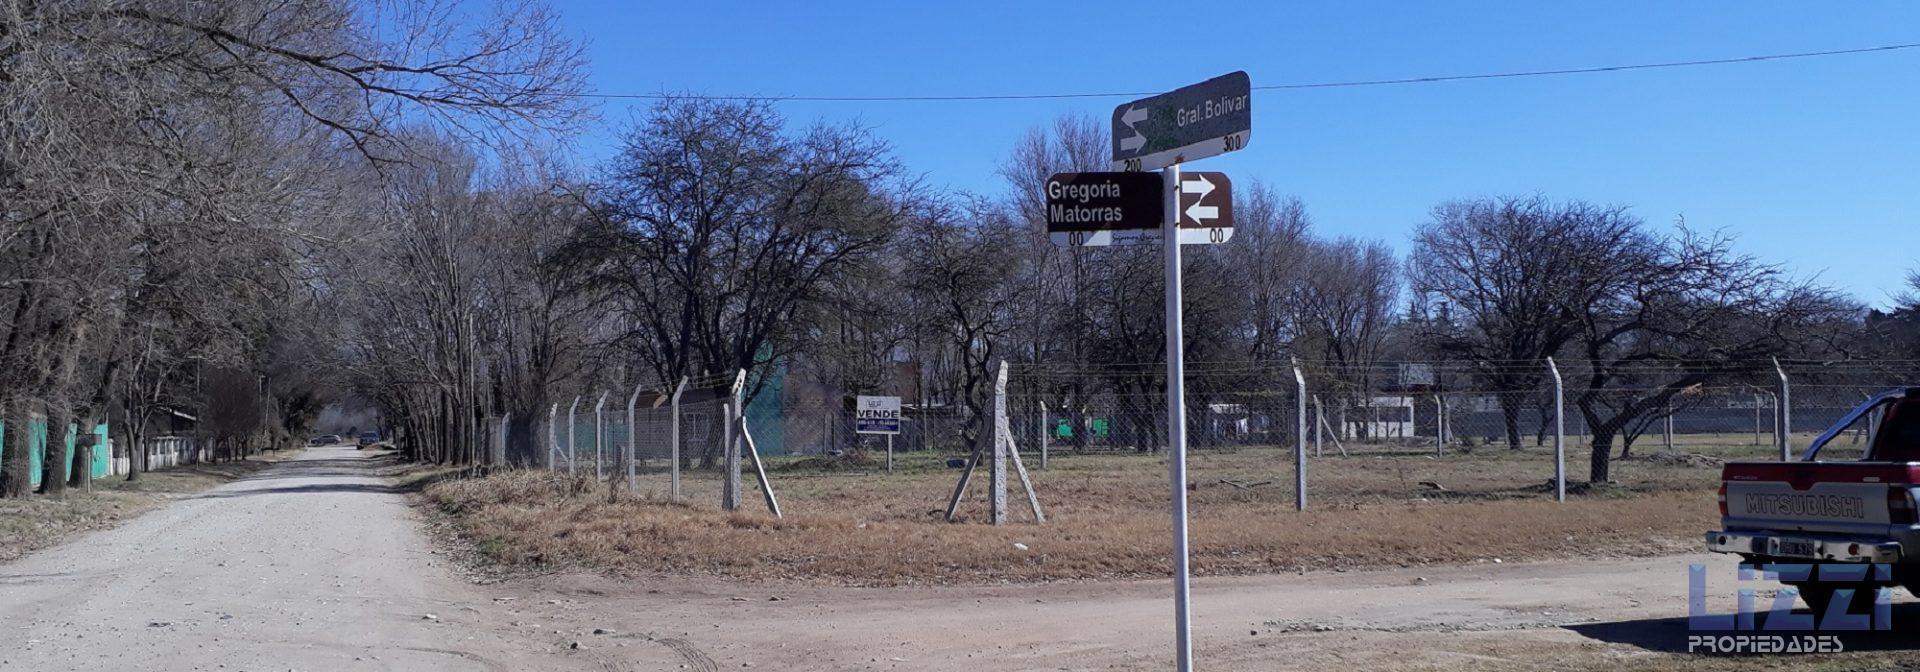 TERRENO EN VENTA VILLA MONTENEGRO ANISACATE ESCRITURA ESQUINA AGUA 1250 m2